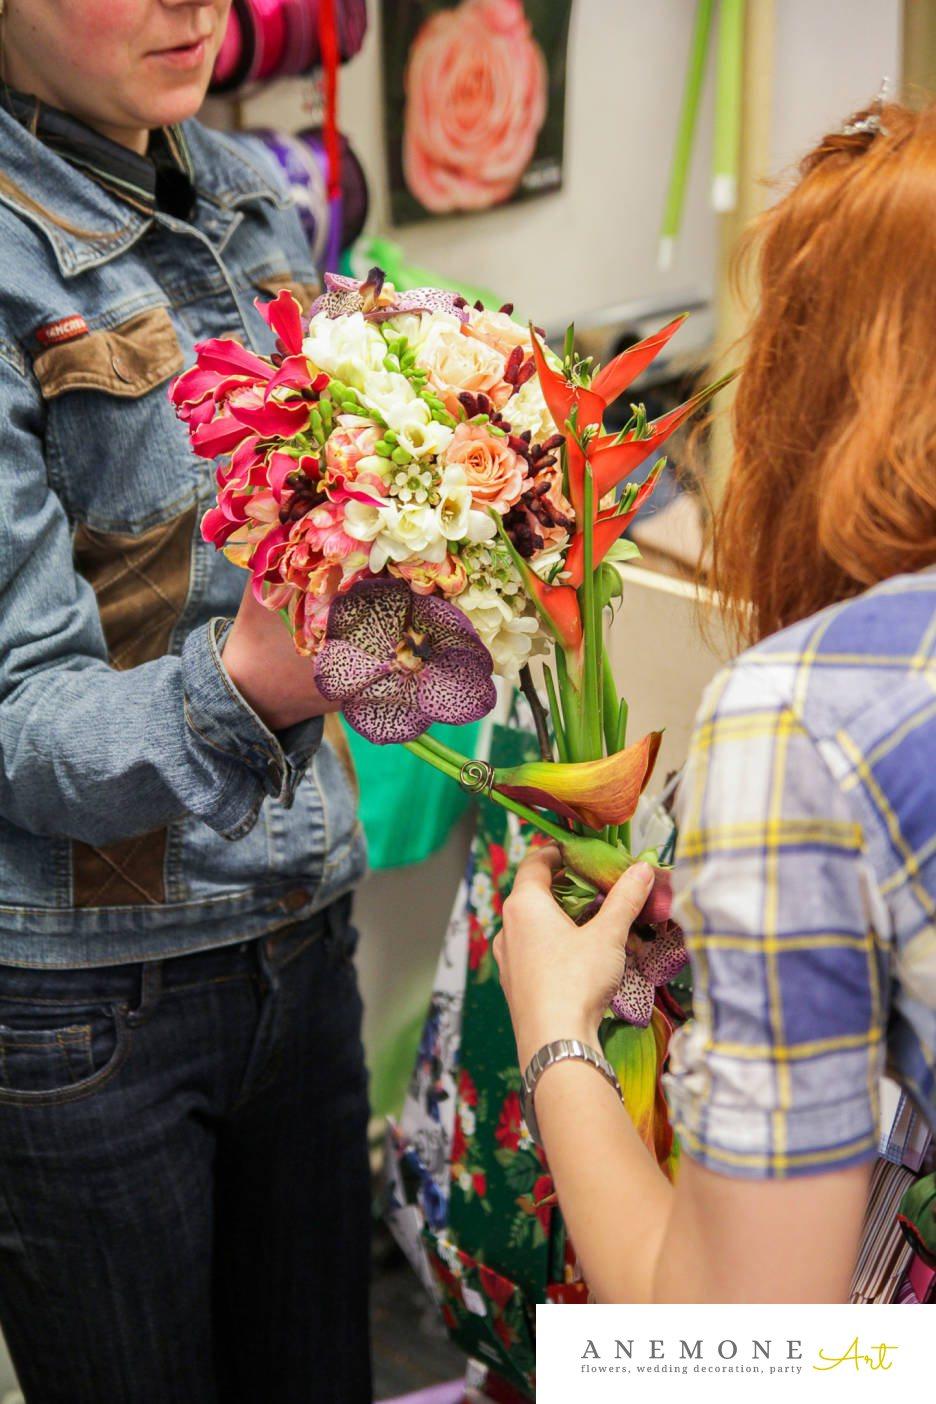 Poza, foto cu Flori de nunta buchet mireasa, calla, curgator, frezii, gipsofila, lacramioare, lisianthus, multicolor, ornitogallum in Arad, Timisoara, Oradea (wedding flowers, bouquets) nunta Arad, Timisoara, Oradea